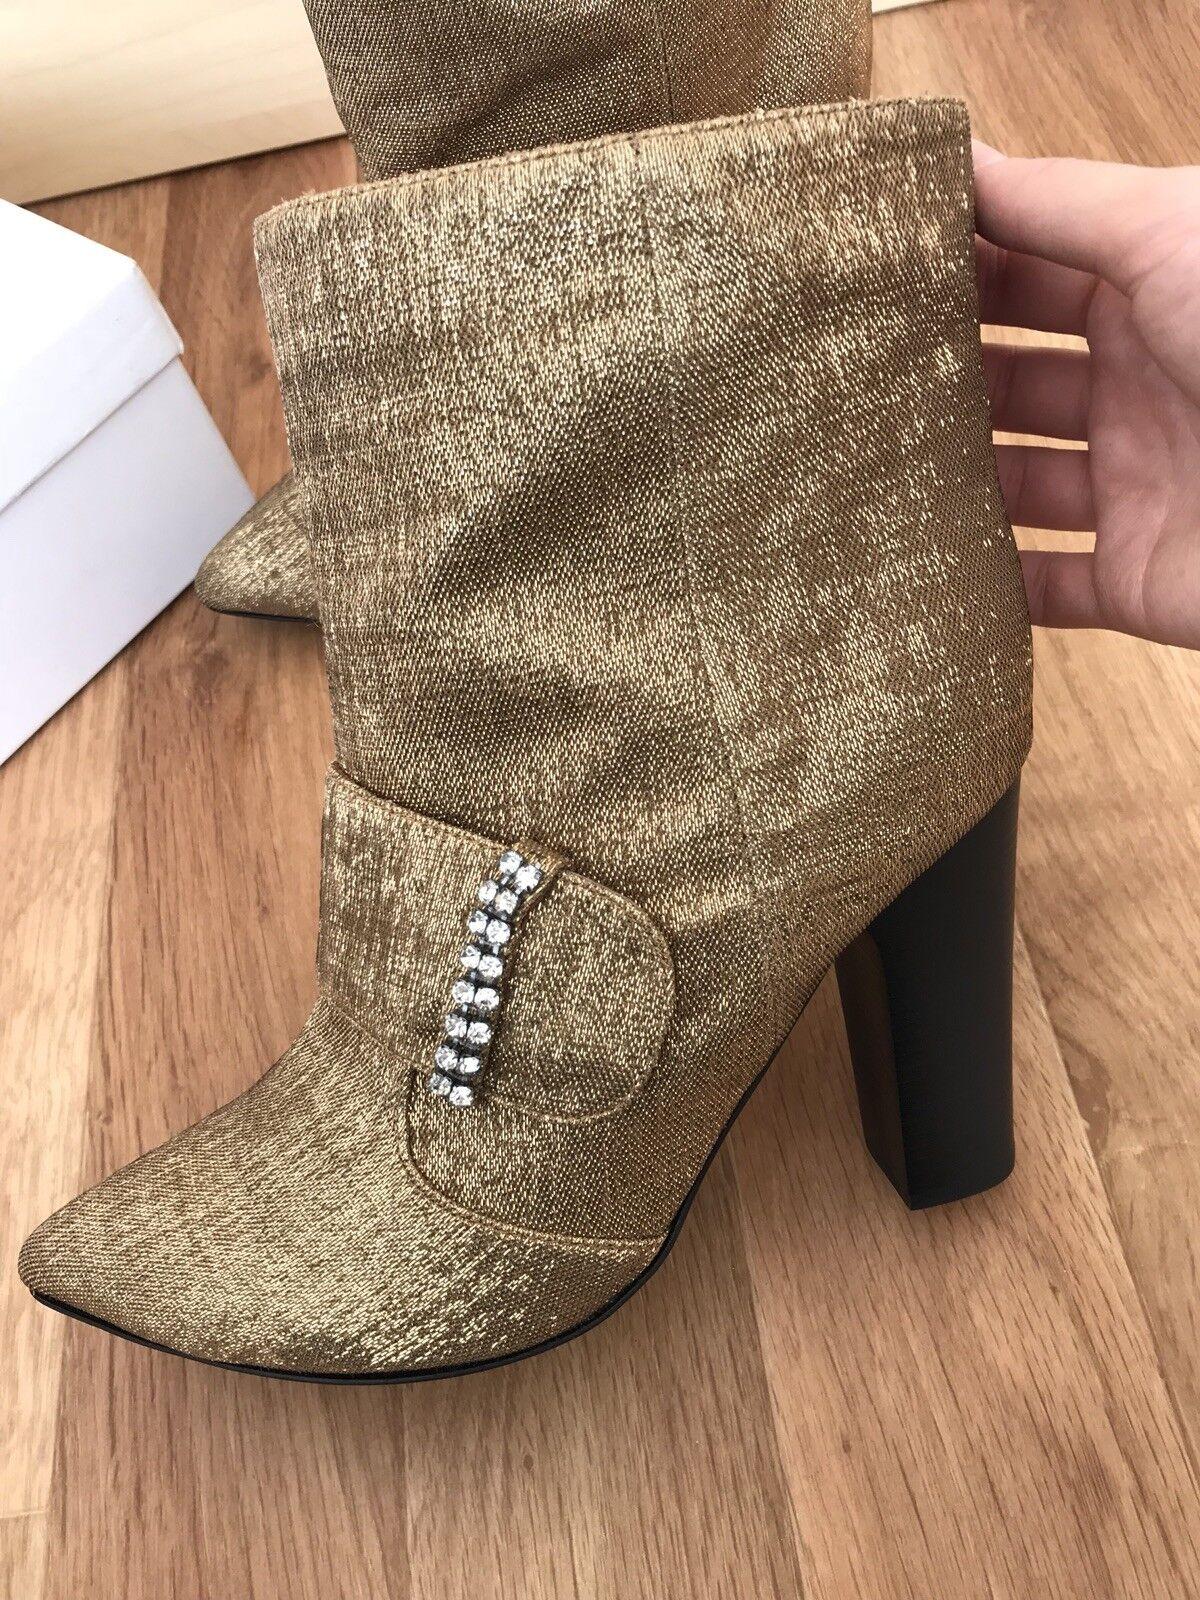 See by CHLOE    Schuhe Stiefeletten Luxus Leder Couture Gr. 38.5 38 Gold neu   d9d491